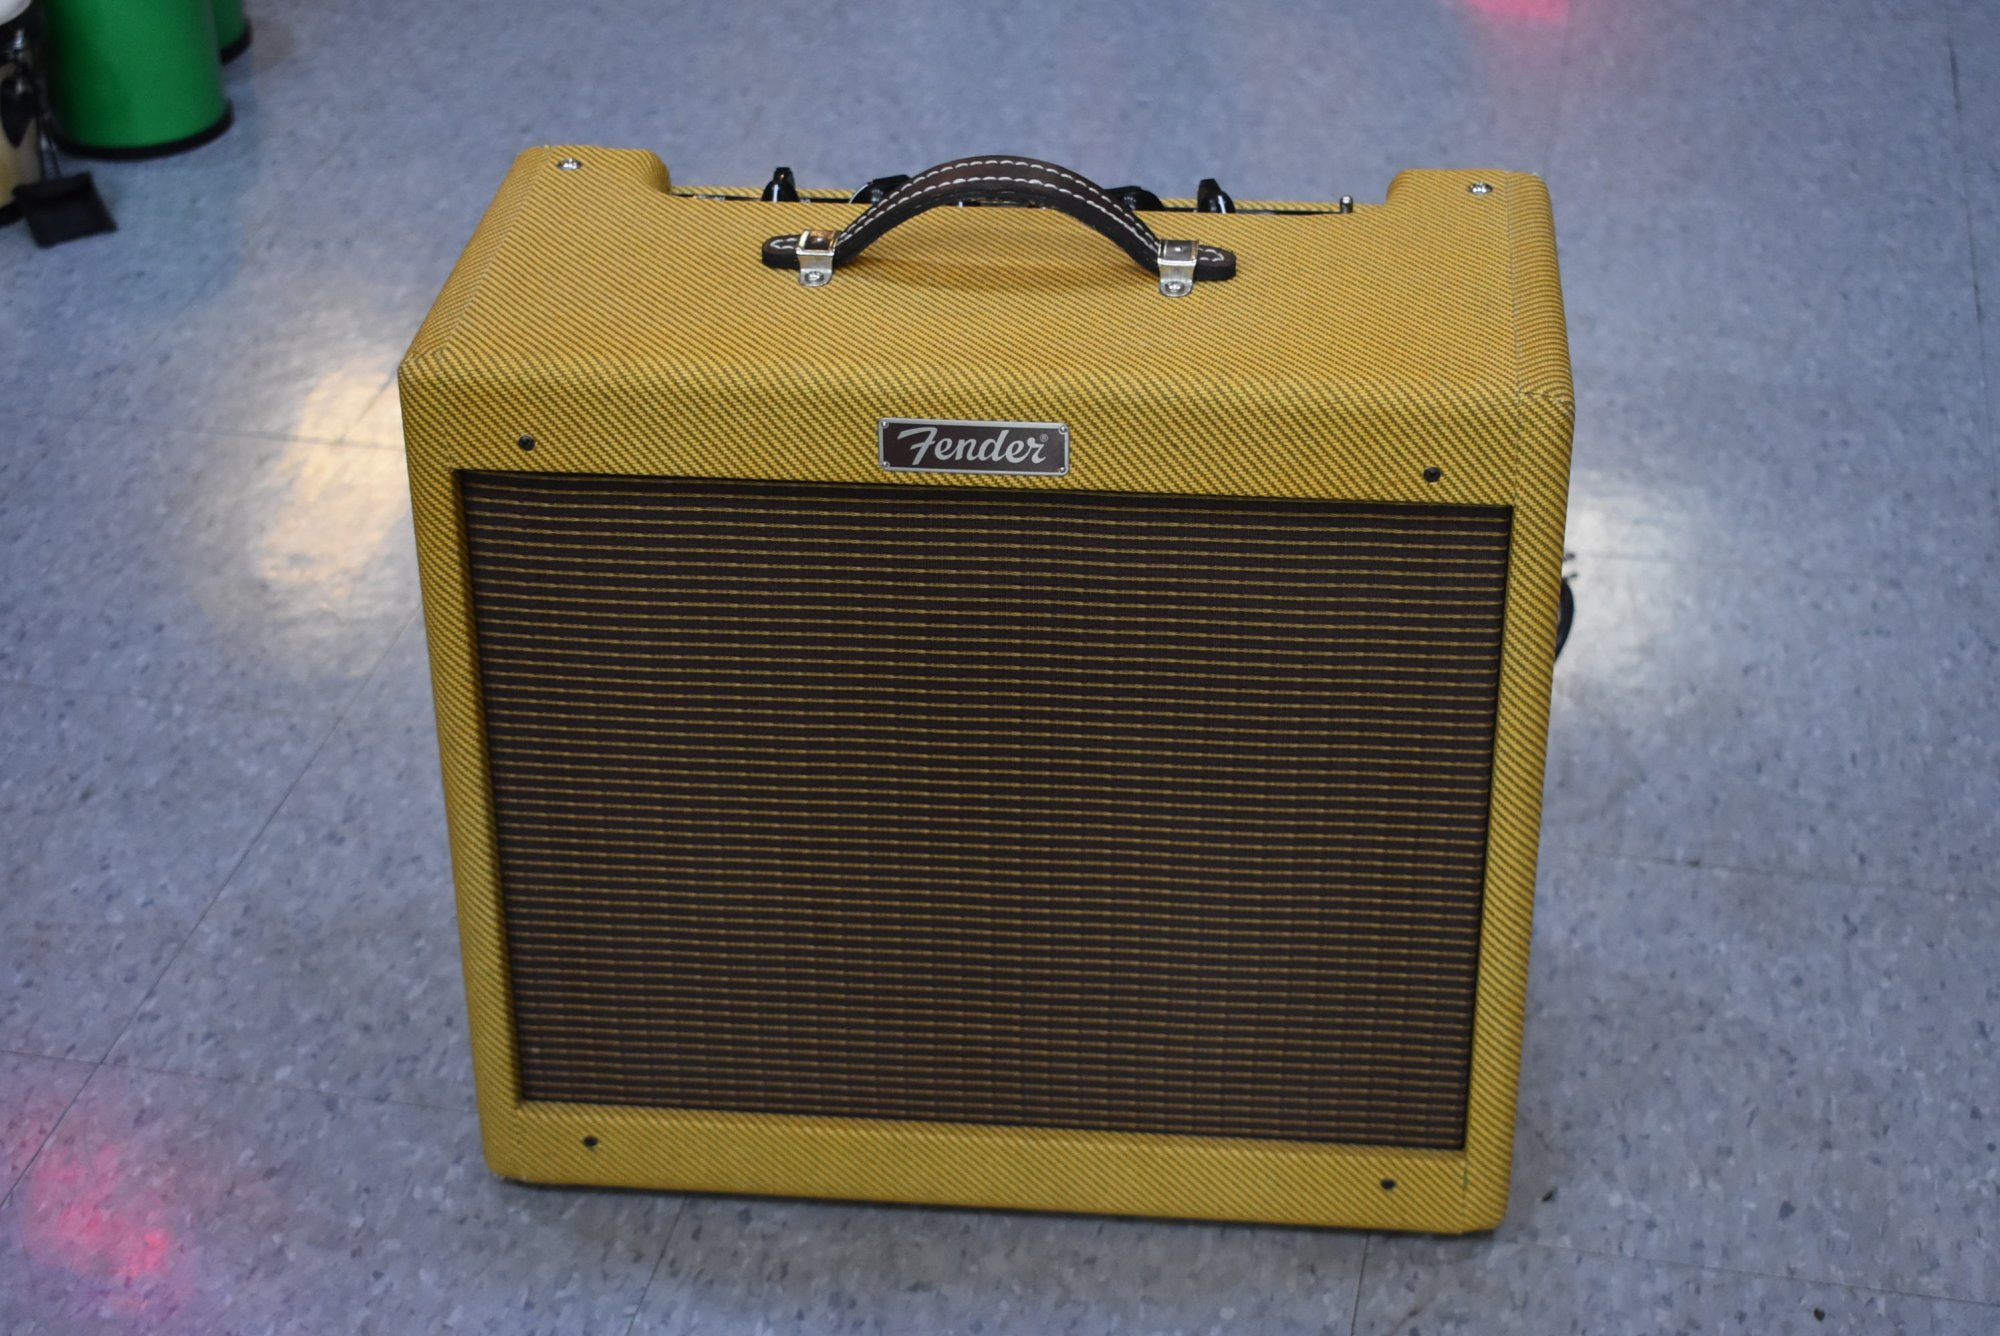 2005 Fender Limited Edition Blues Jr Tweed